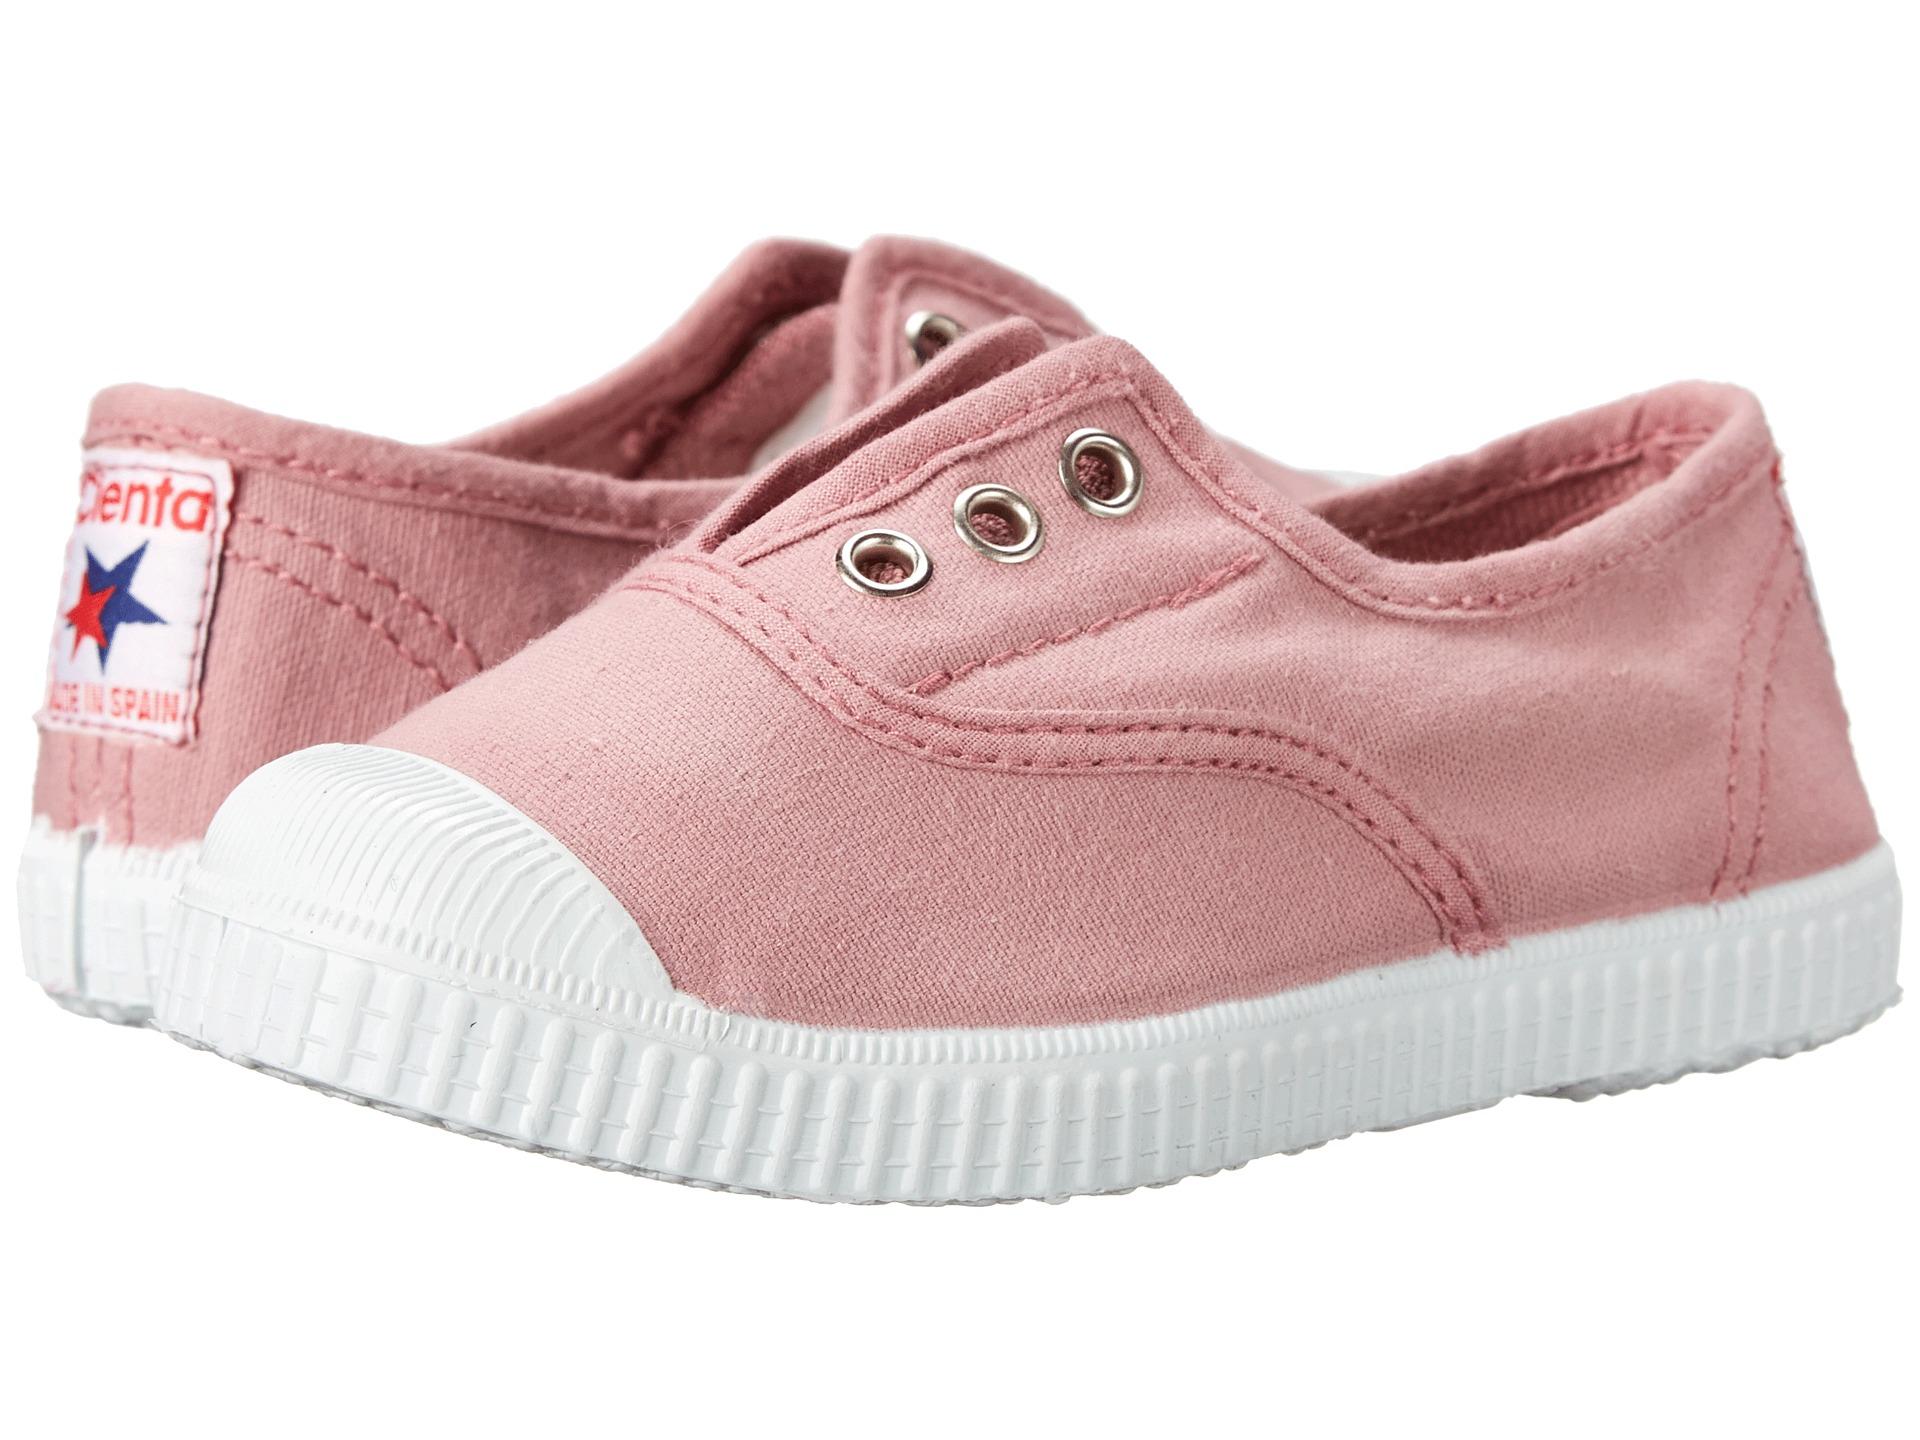 Cienta Shoes Reviews